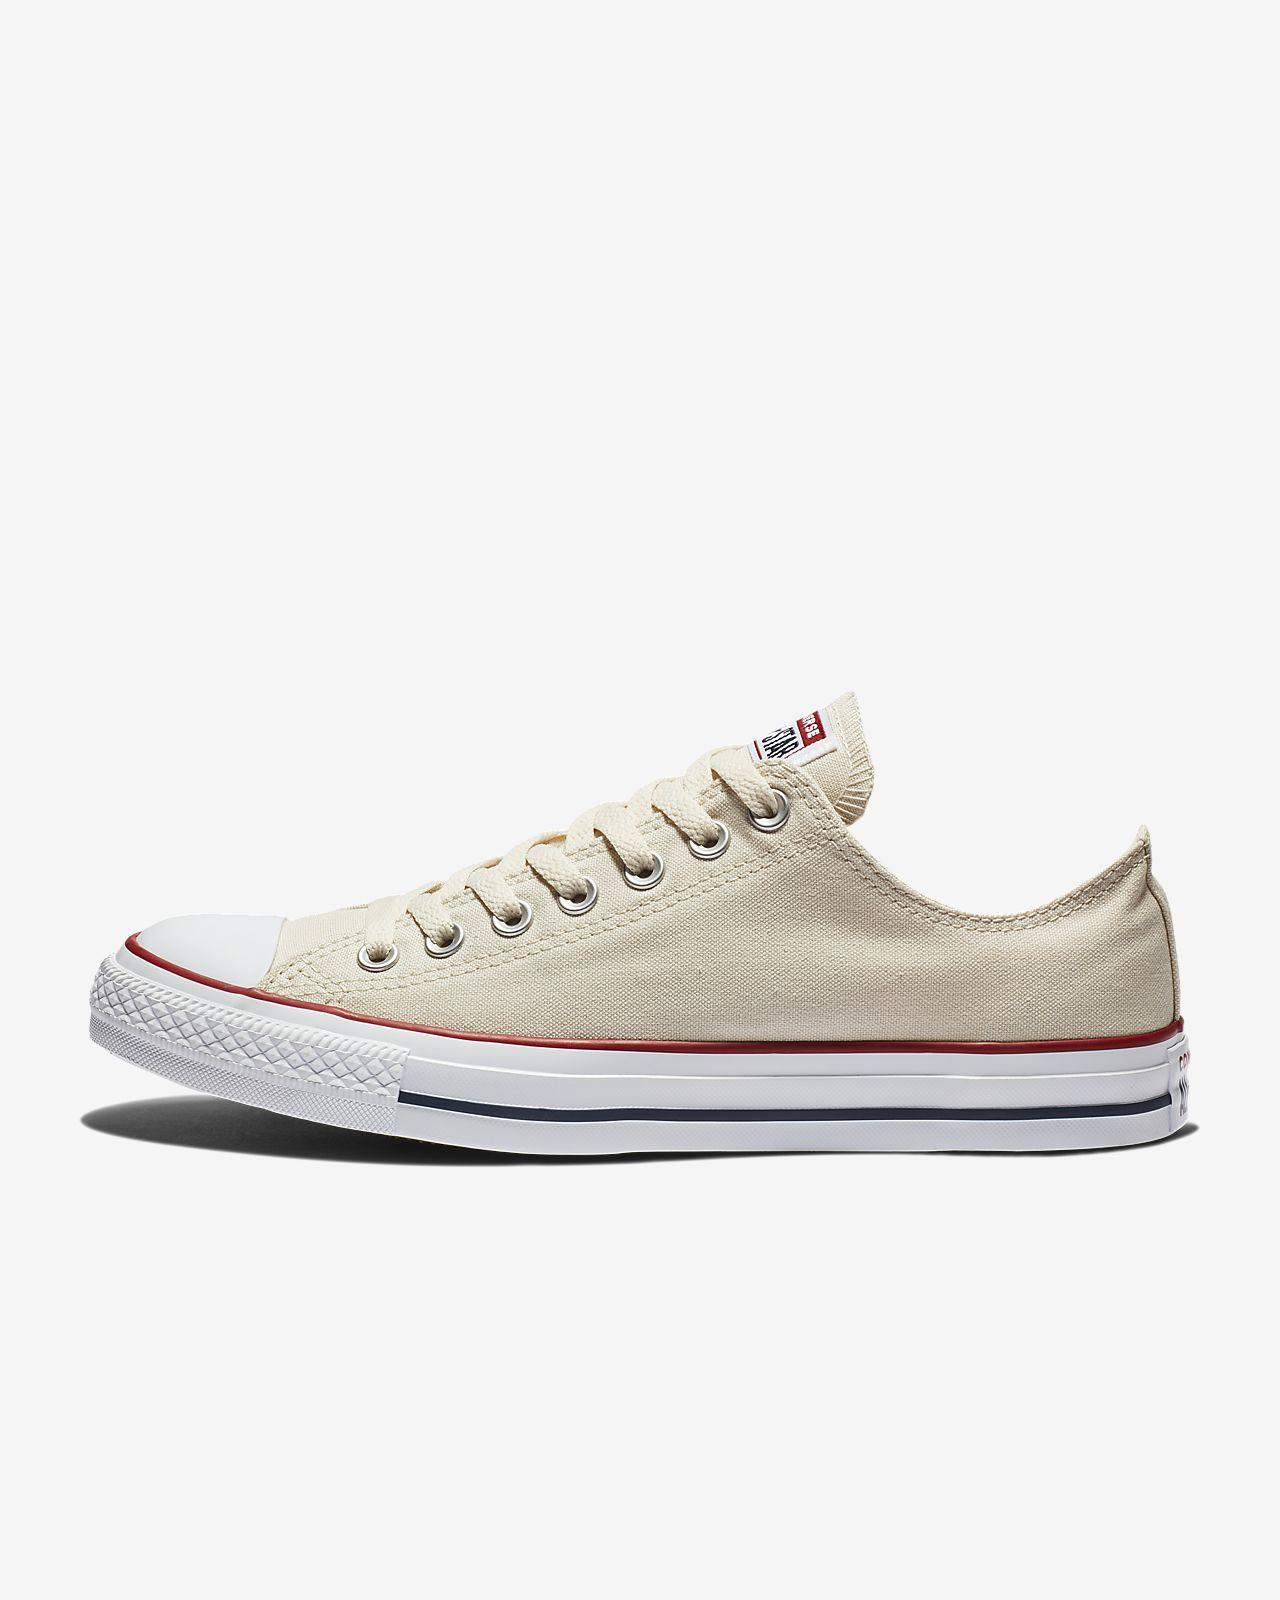 Converse Chuck Taylor All Star Core Unisex Low Top Unisex Shoe